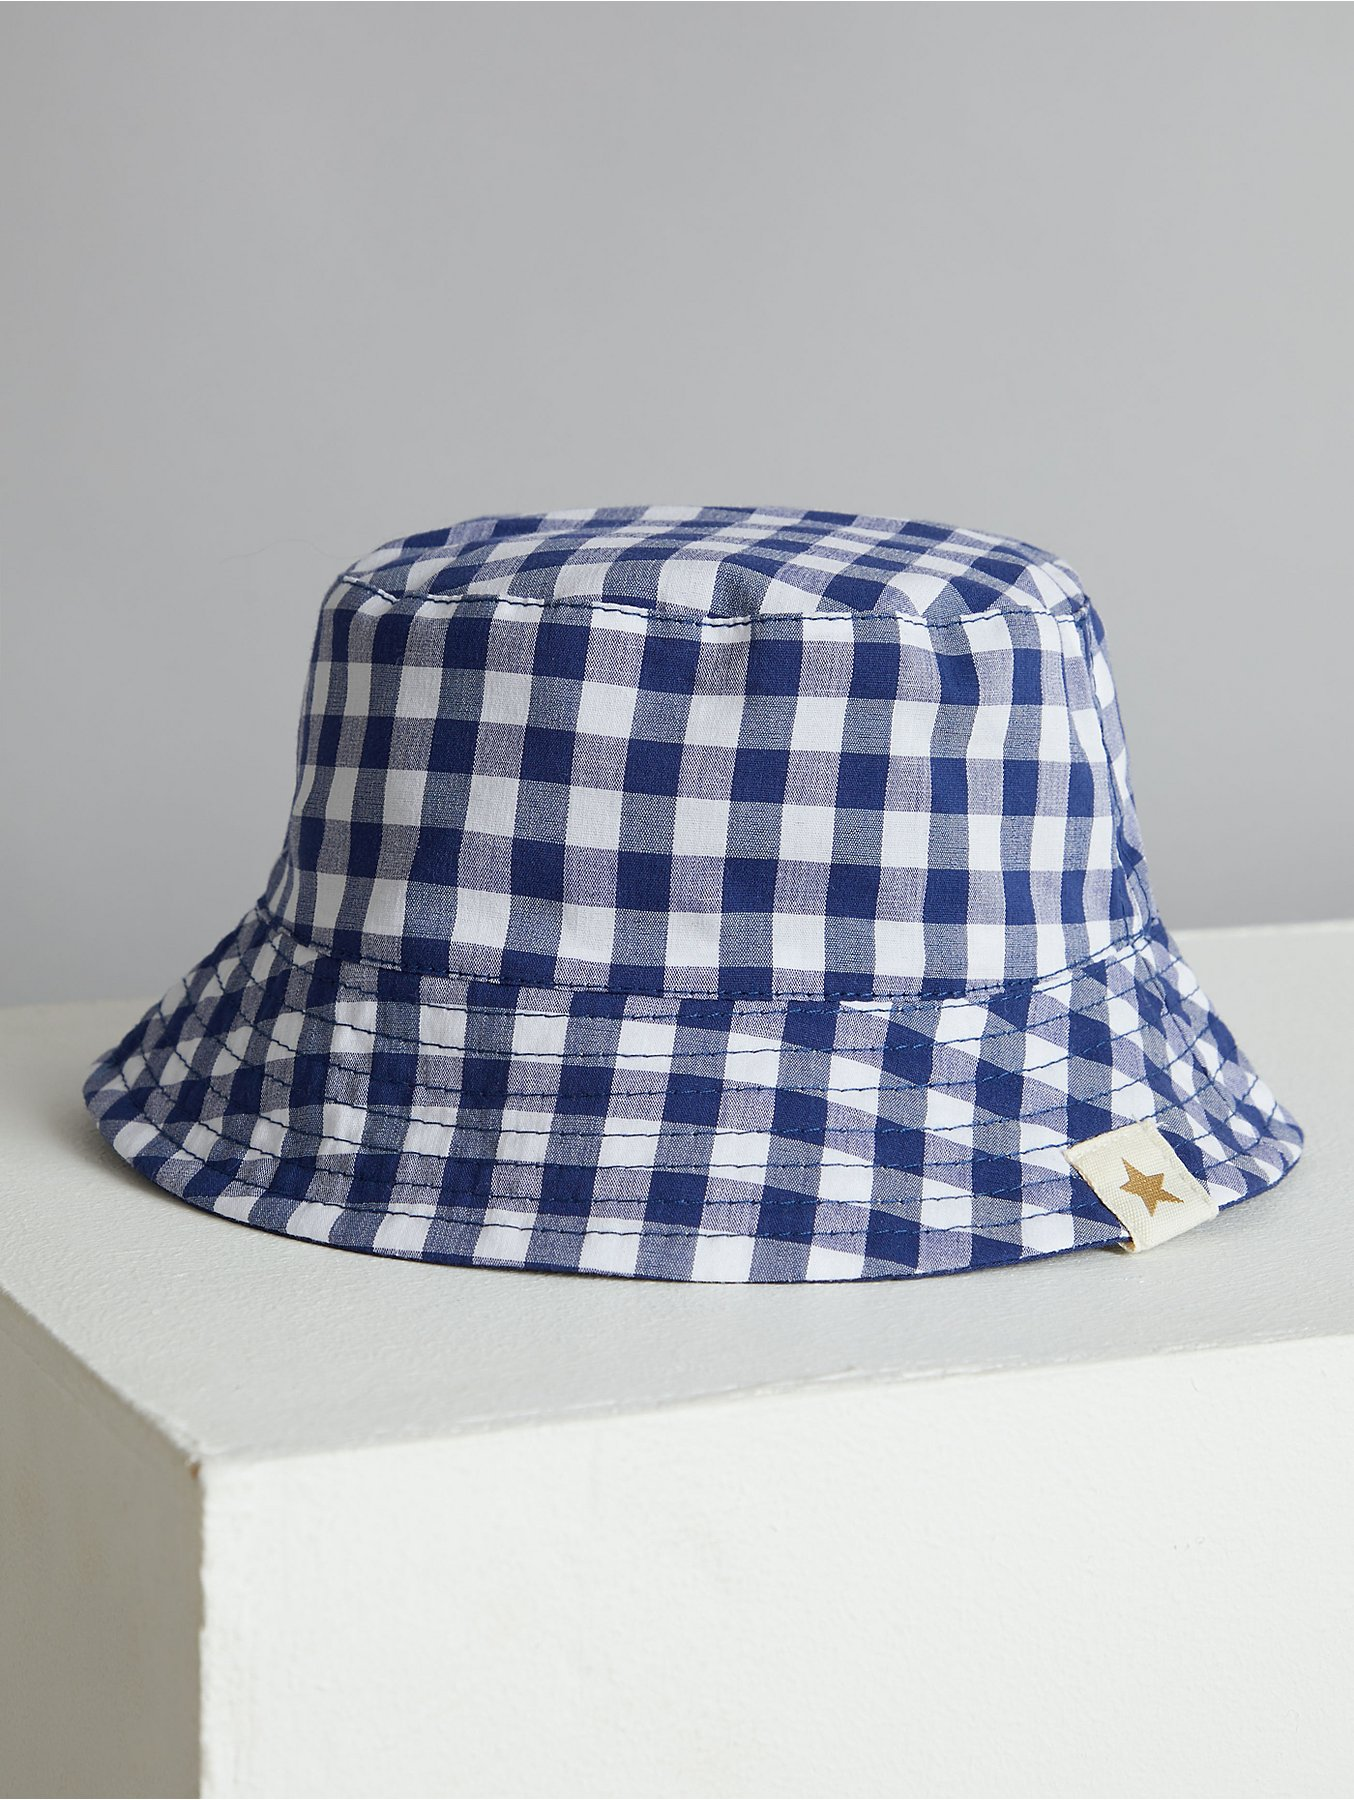 969ef20aa Billie Faiers Navy Gingham Reversible Bucket Hat